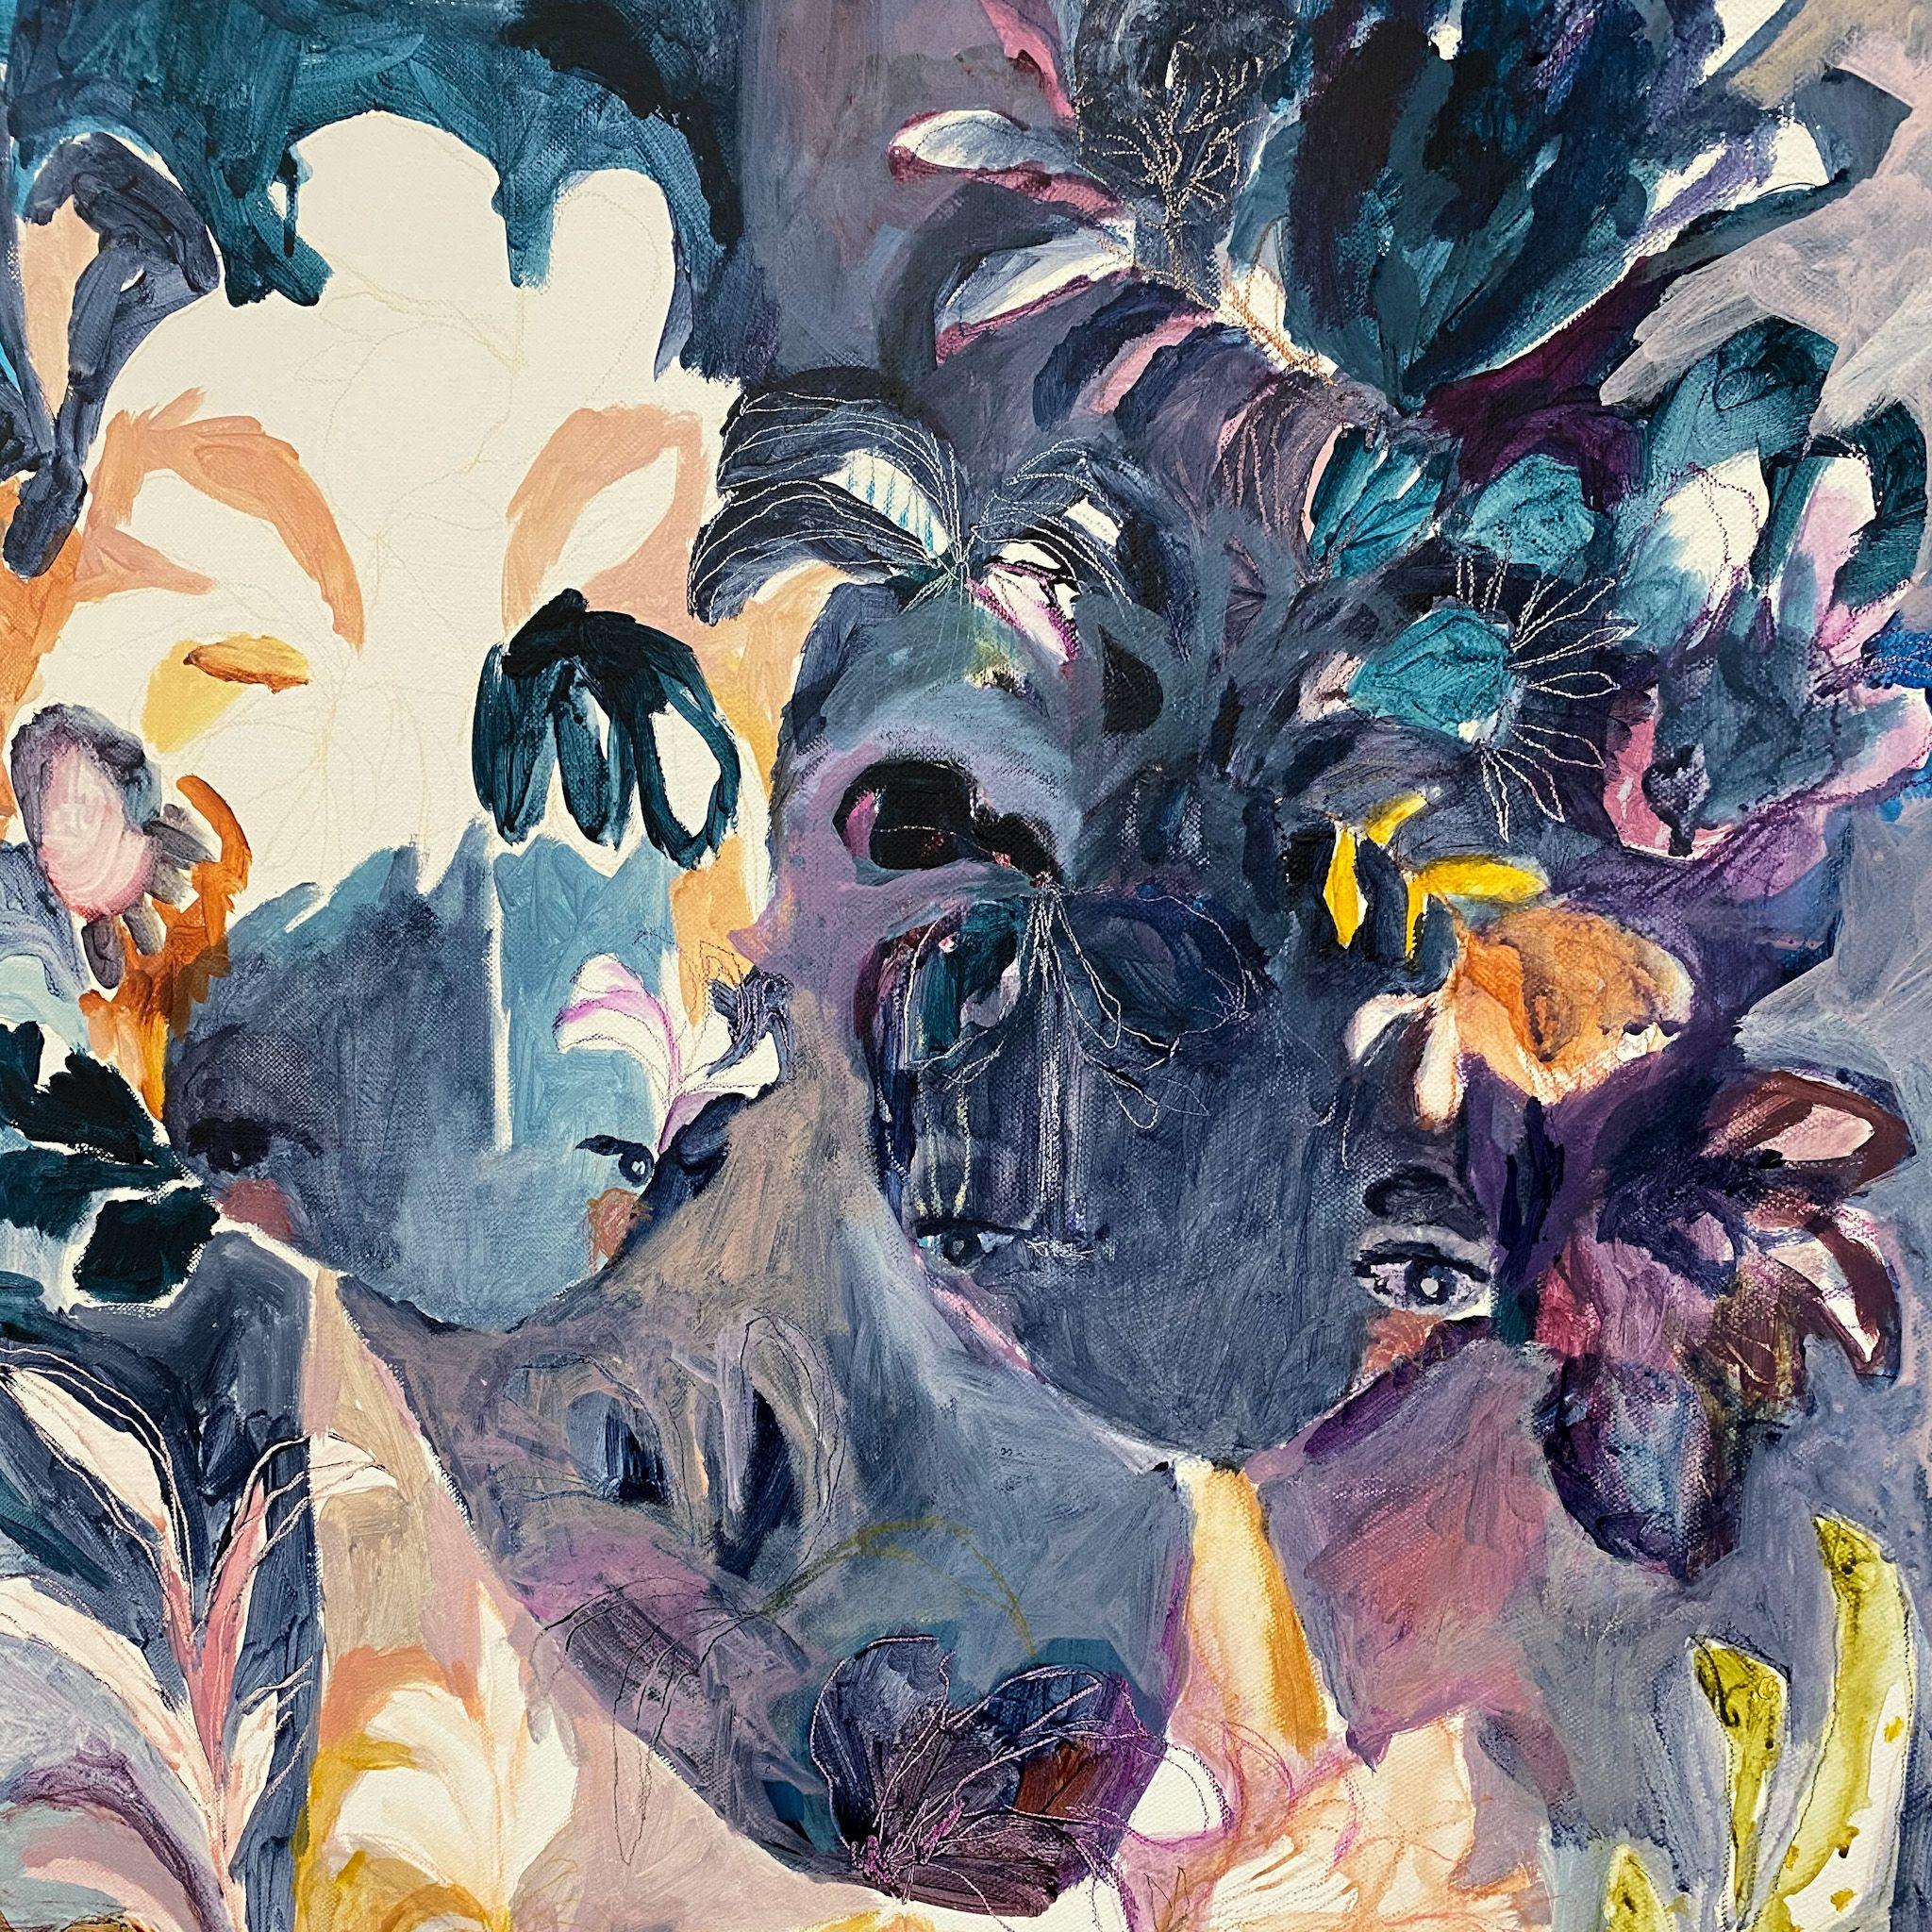 Pin on JANE DONALDSON on canvas